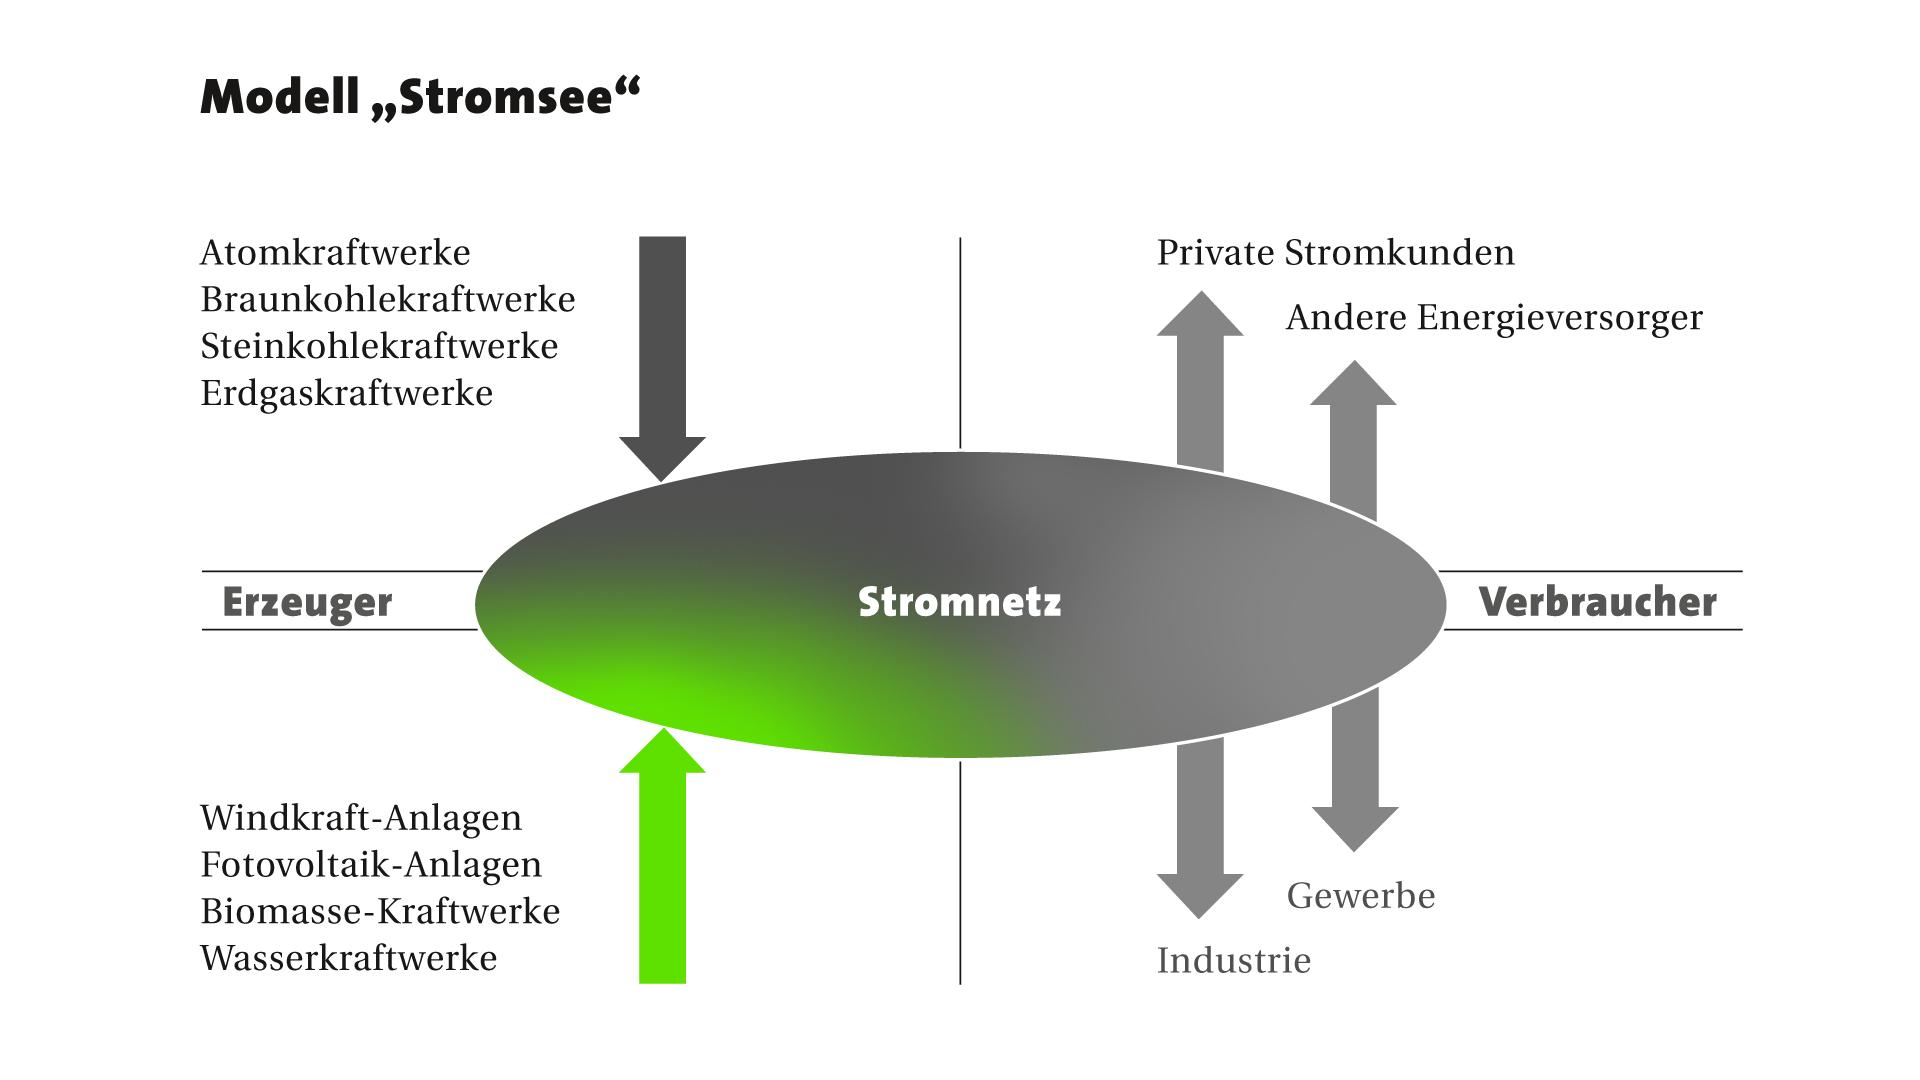 Modell: Stromsee